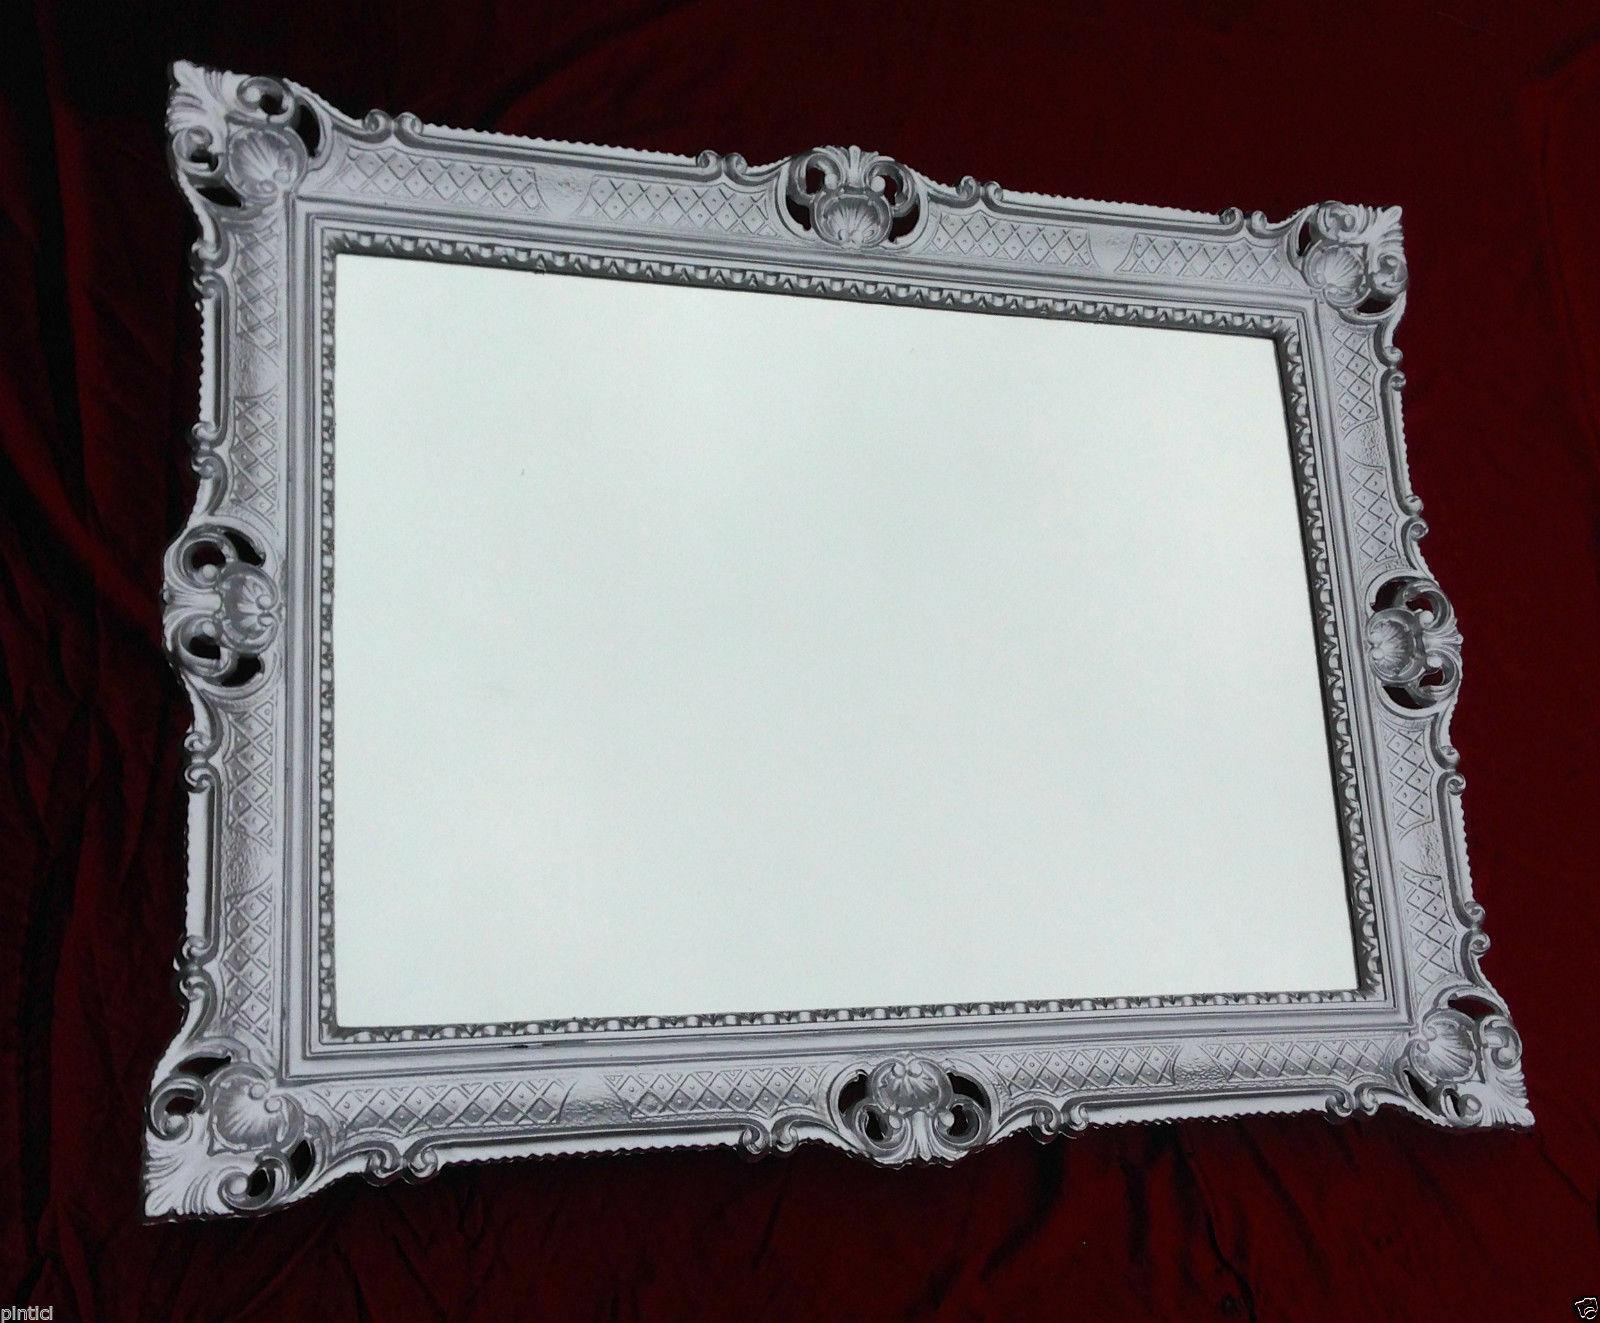 bilderrahmen silber barock xxl 90x70 gemälde/antik spiegel- foto